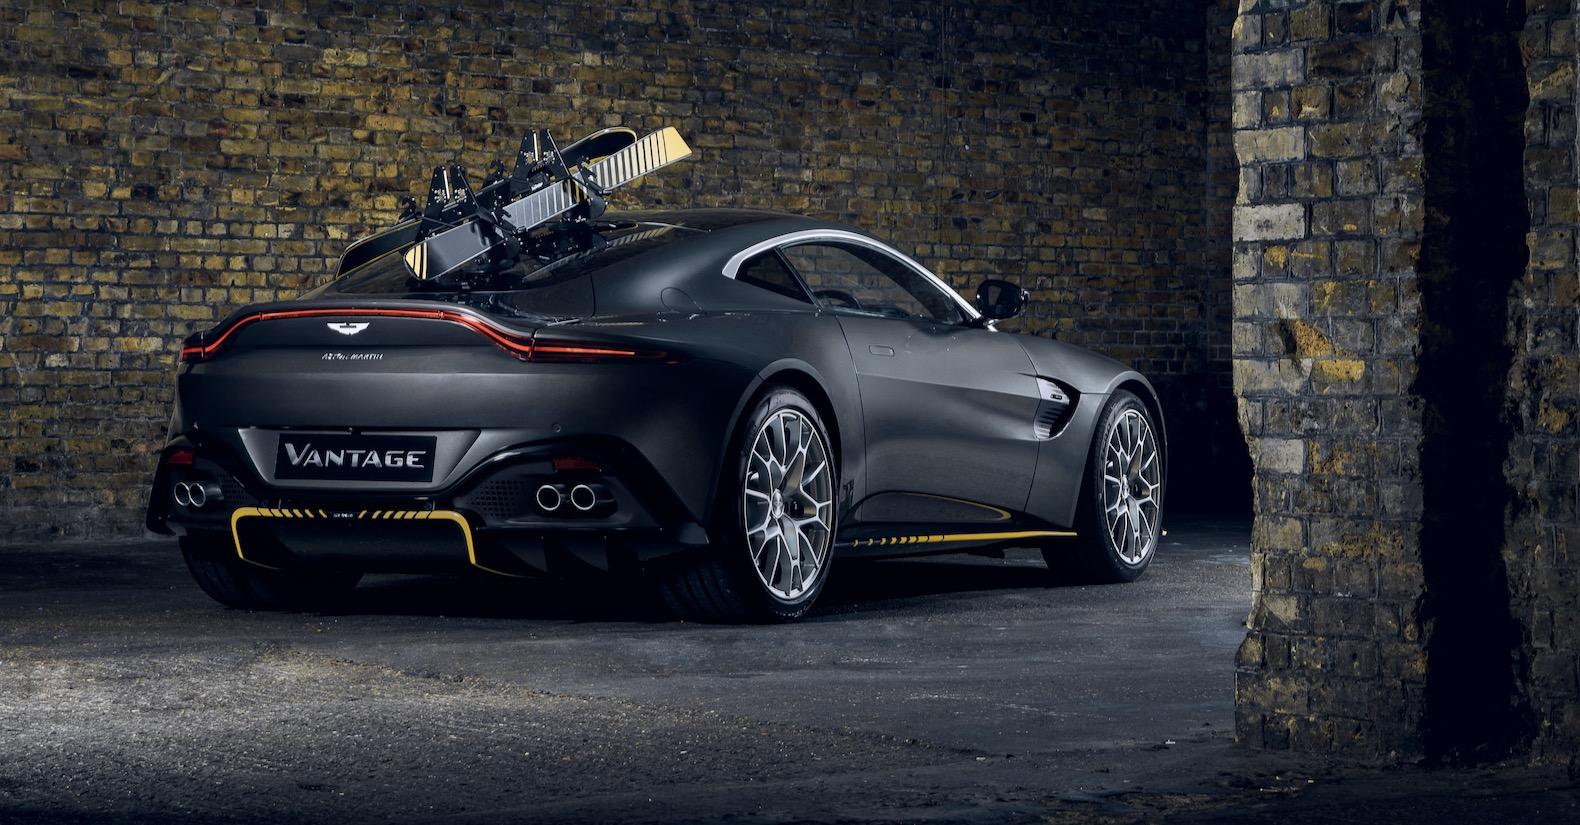 Aston Martin Dbs Superleggera And Vantage 007 Edition Welcomes No Time To Die In Cinemas Slashgear